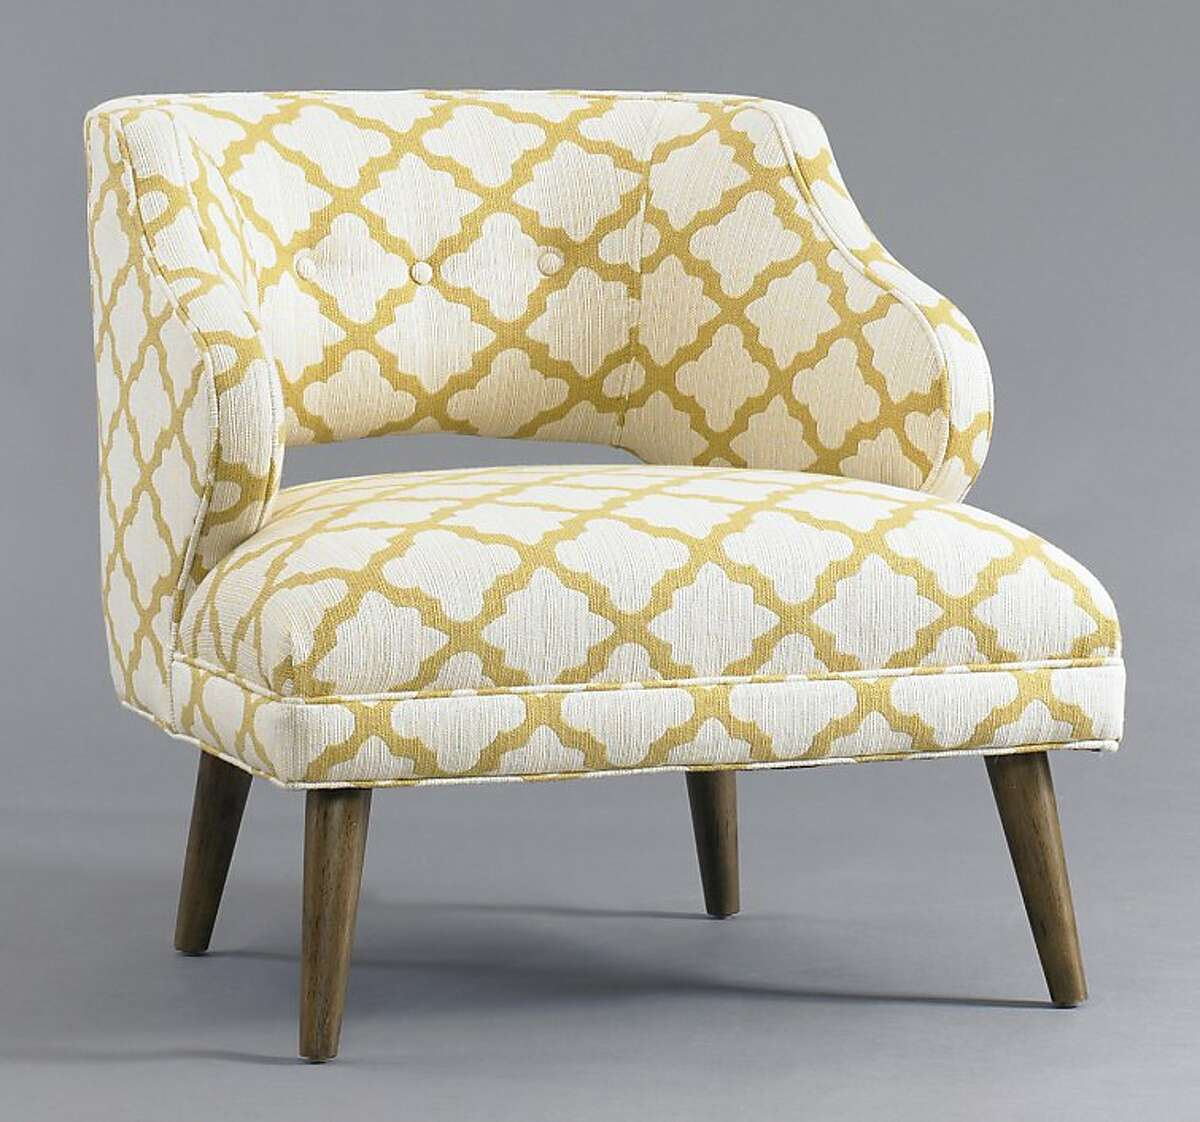 More: $1,290 The Mallory Chair in CasaBlanca Geo Citrine from DwellStudio (dwellstudio.com)